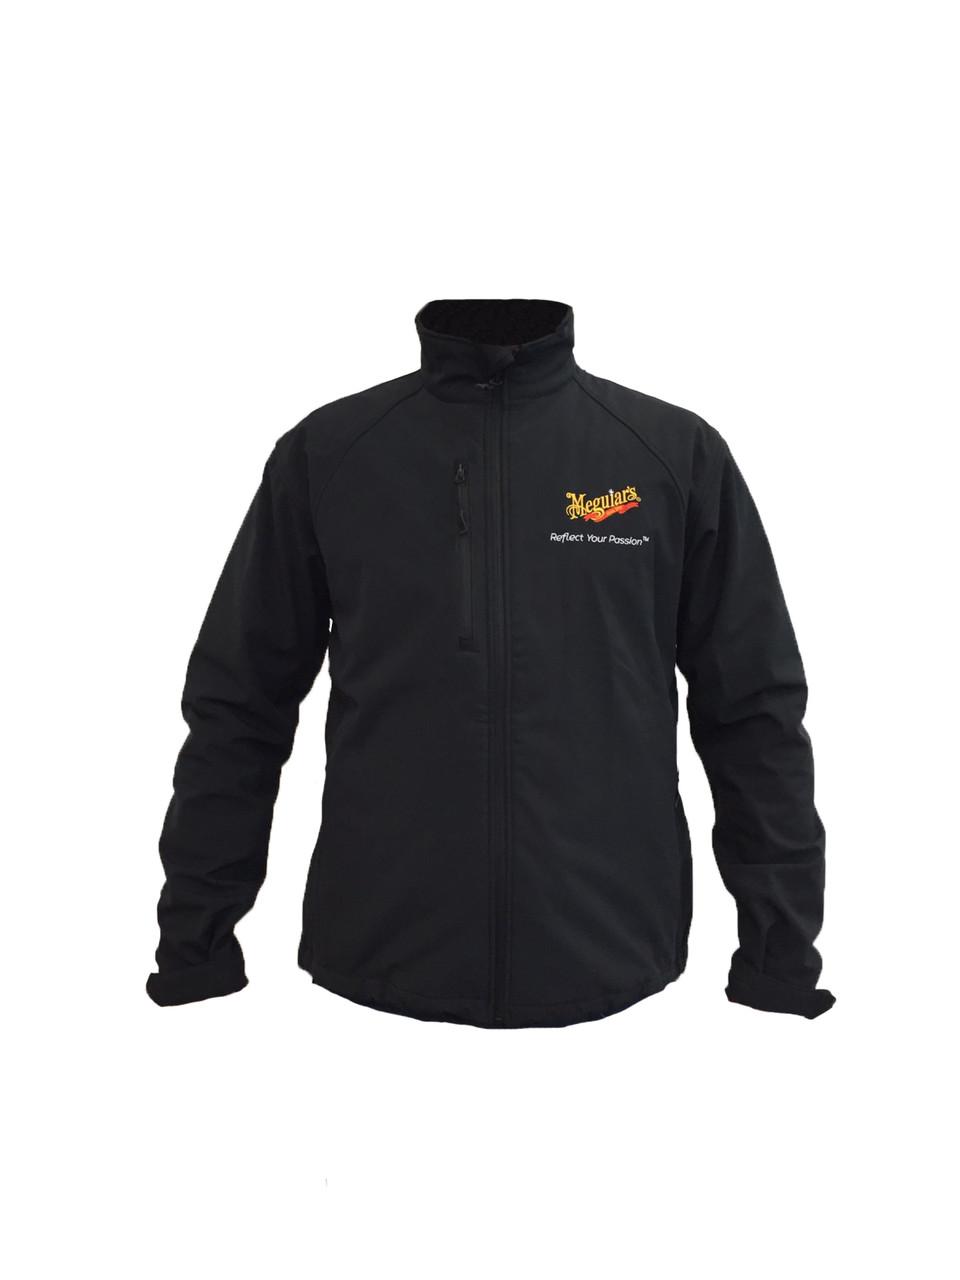 Куртка софтшелл - Meguiar's Softshell Jacken Männer XXL чорний (SOFTSHELLGER_MEN_XXL)